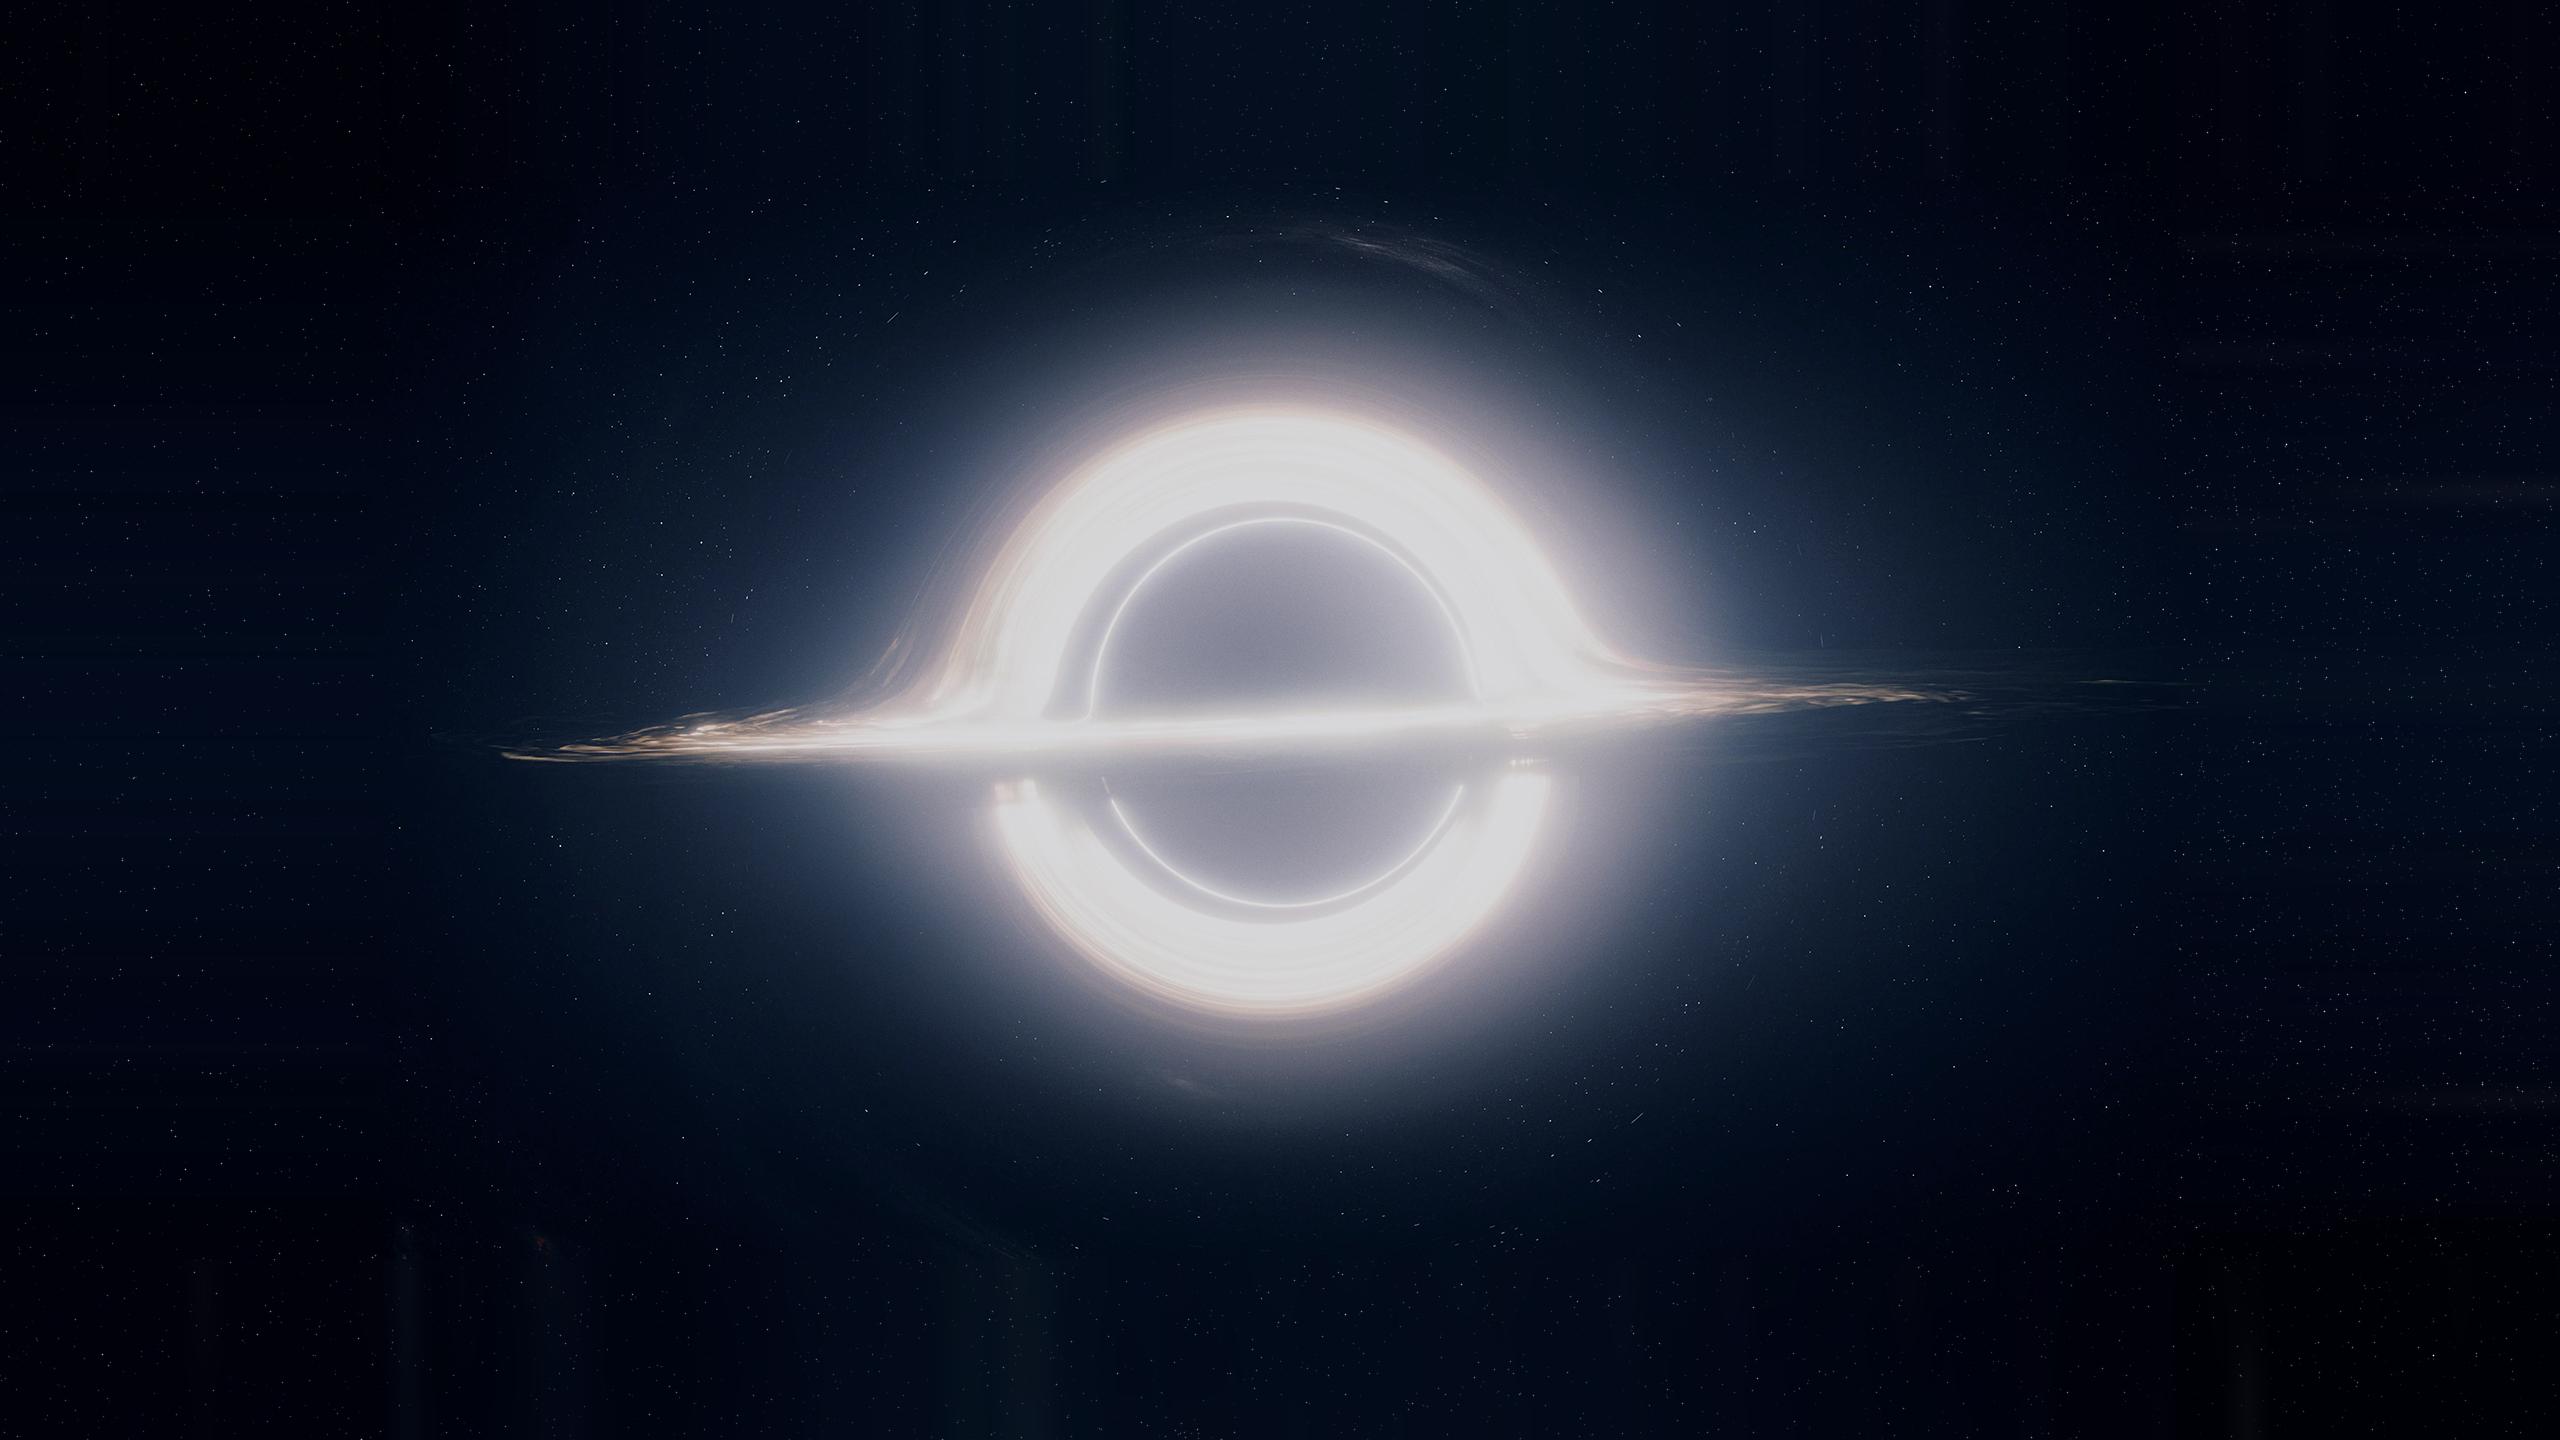 General 2560x1440 space Interstellar (movie) black holes supermassive black hole astronomy